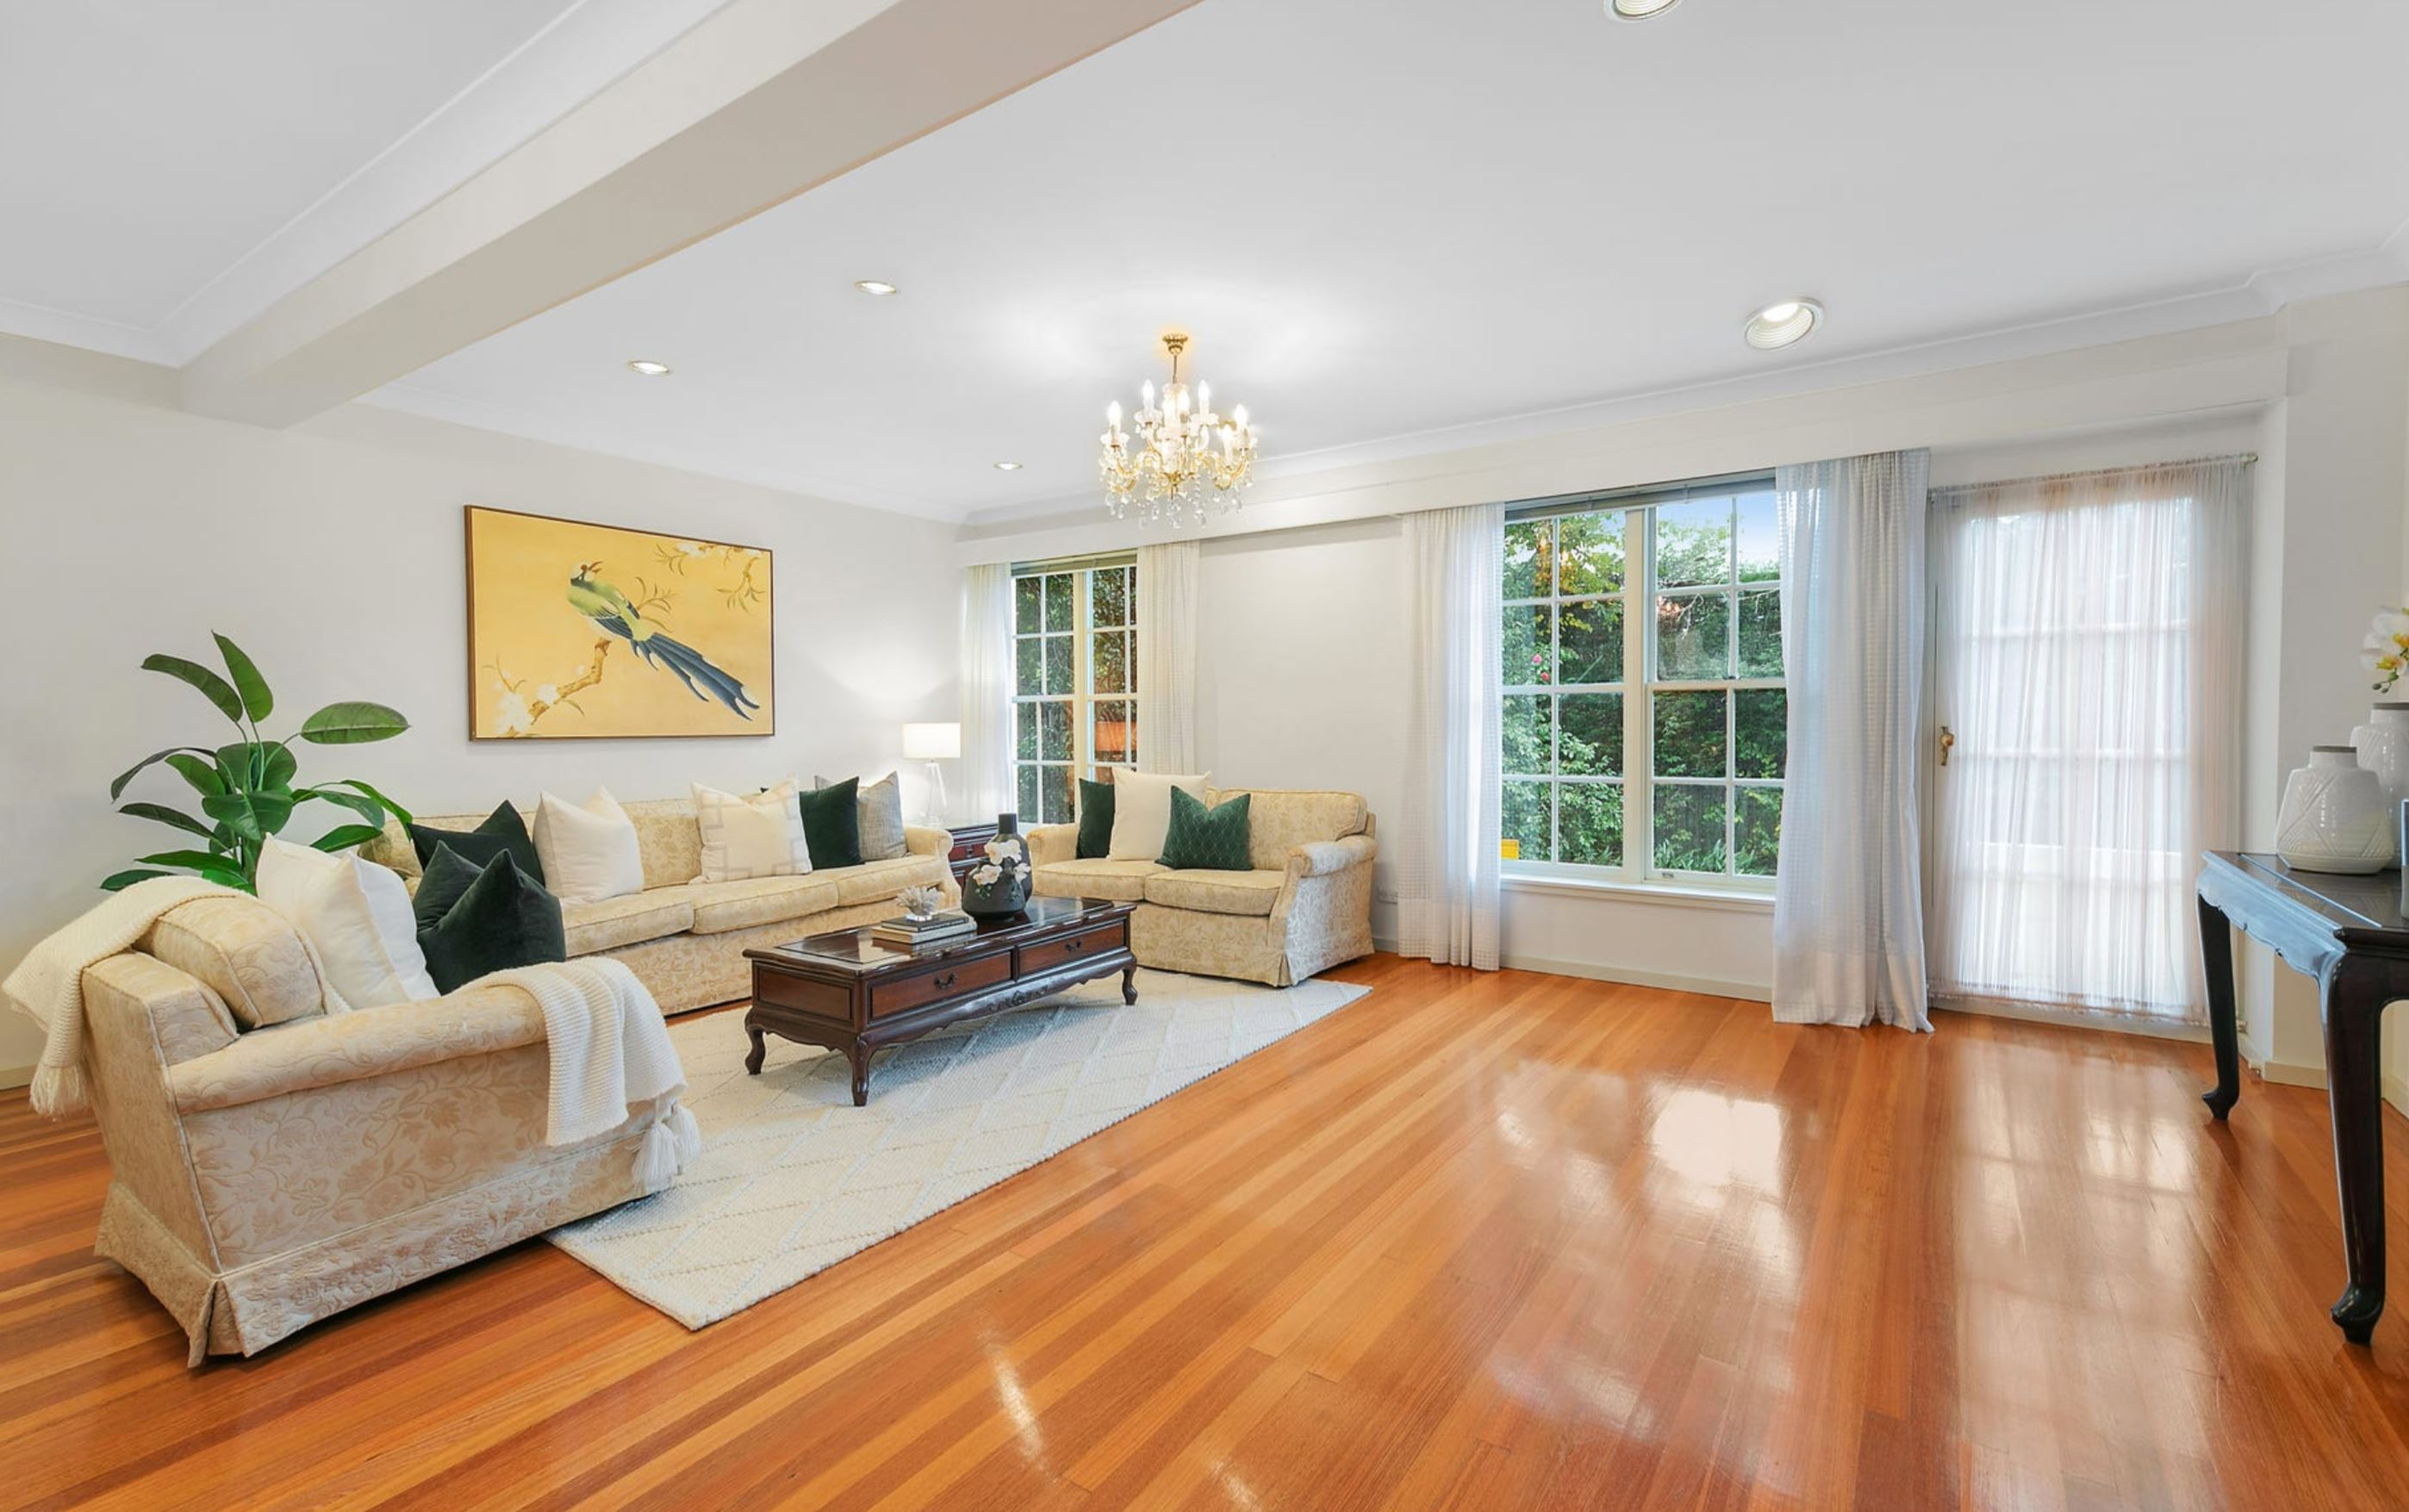 https://www.propertybuyer.com.au/hubfs/deb levin